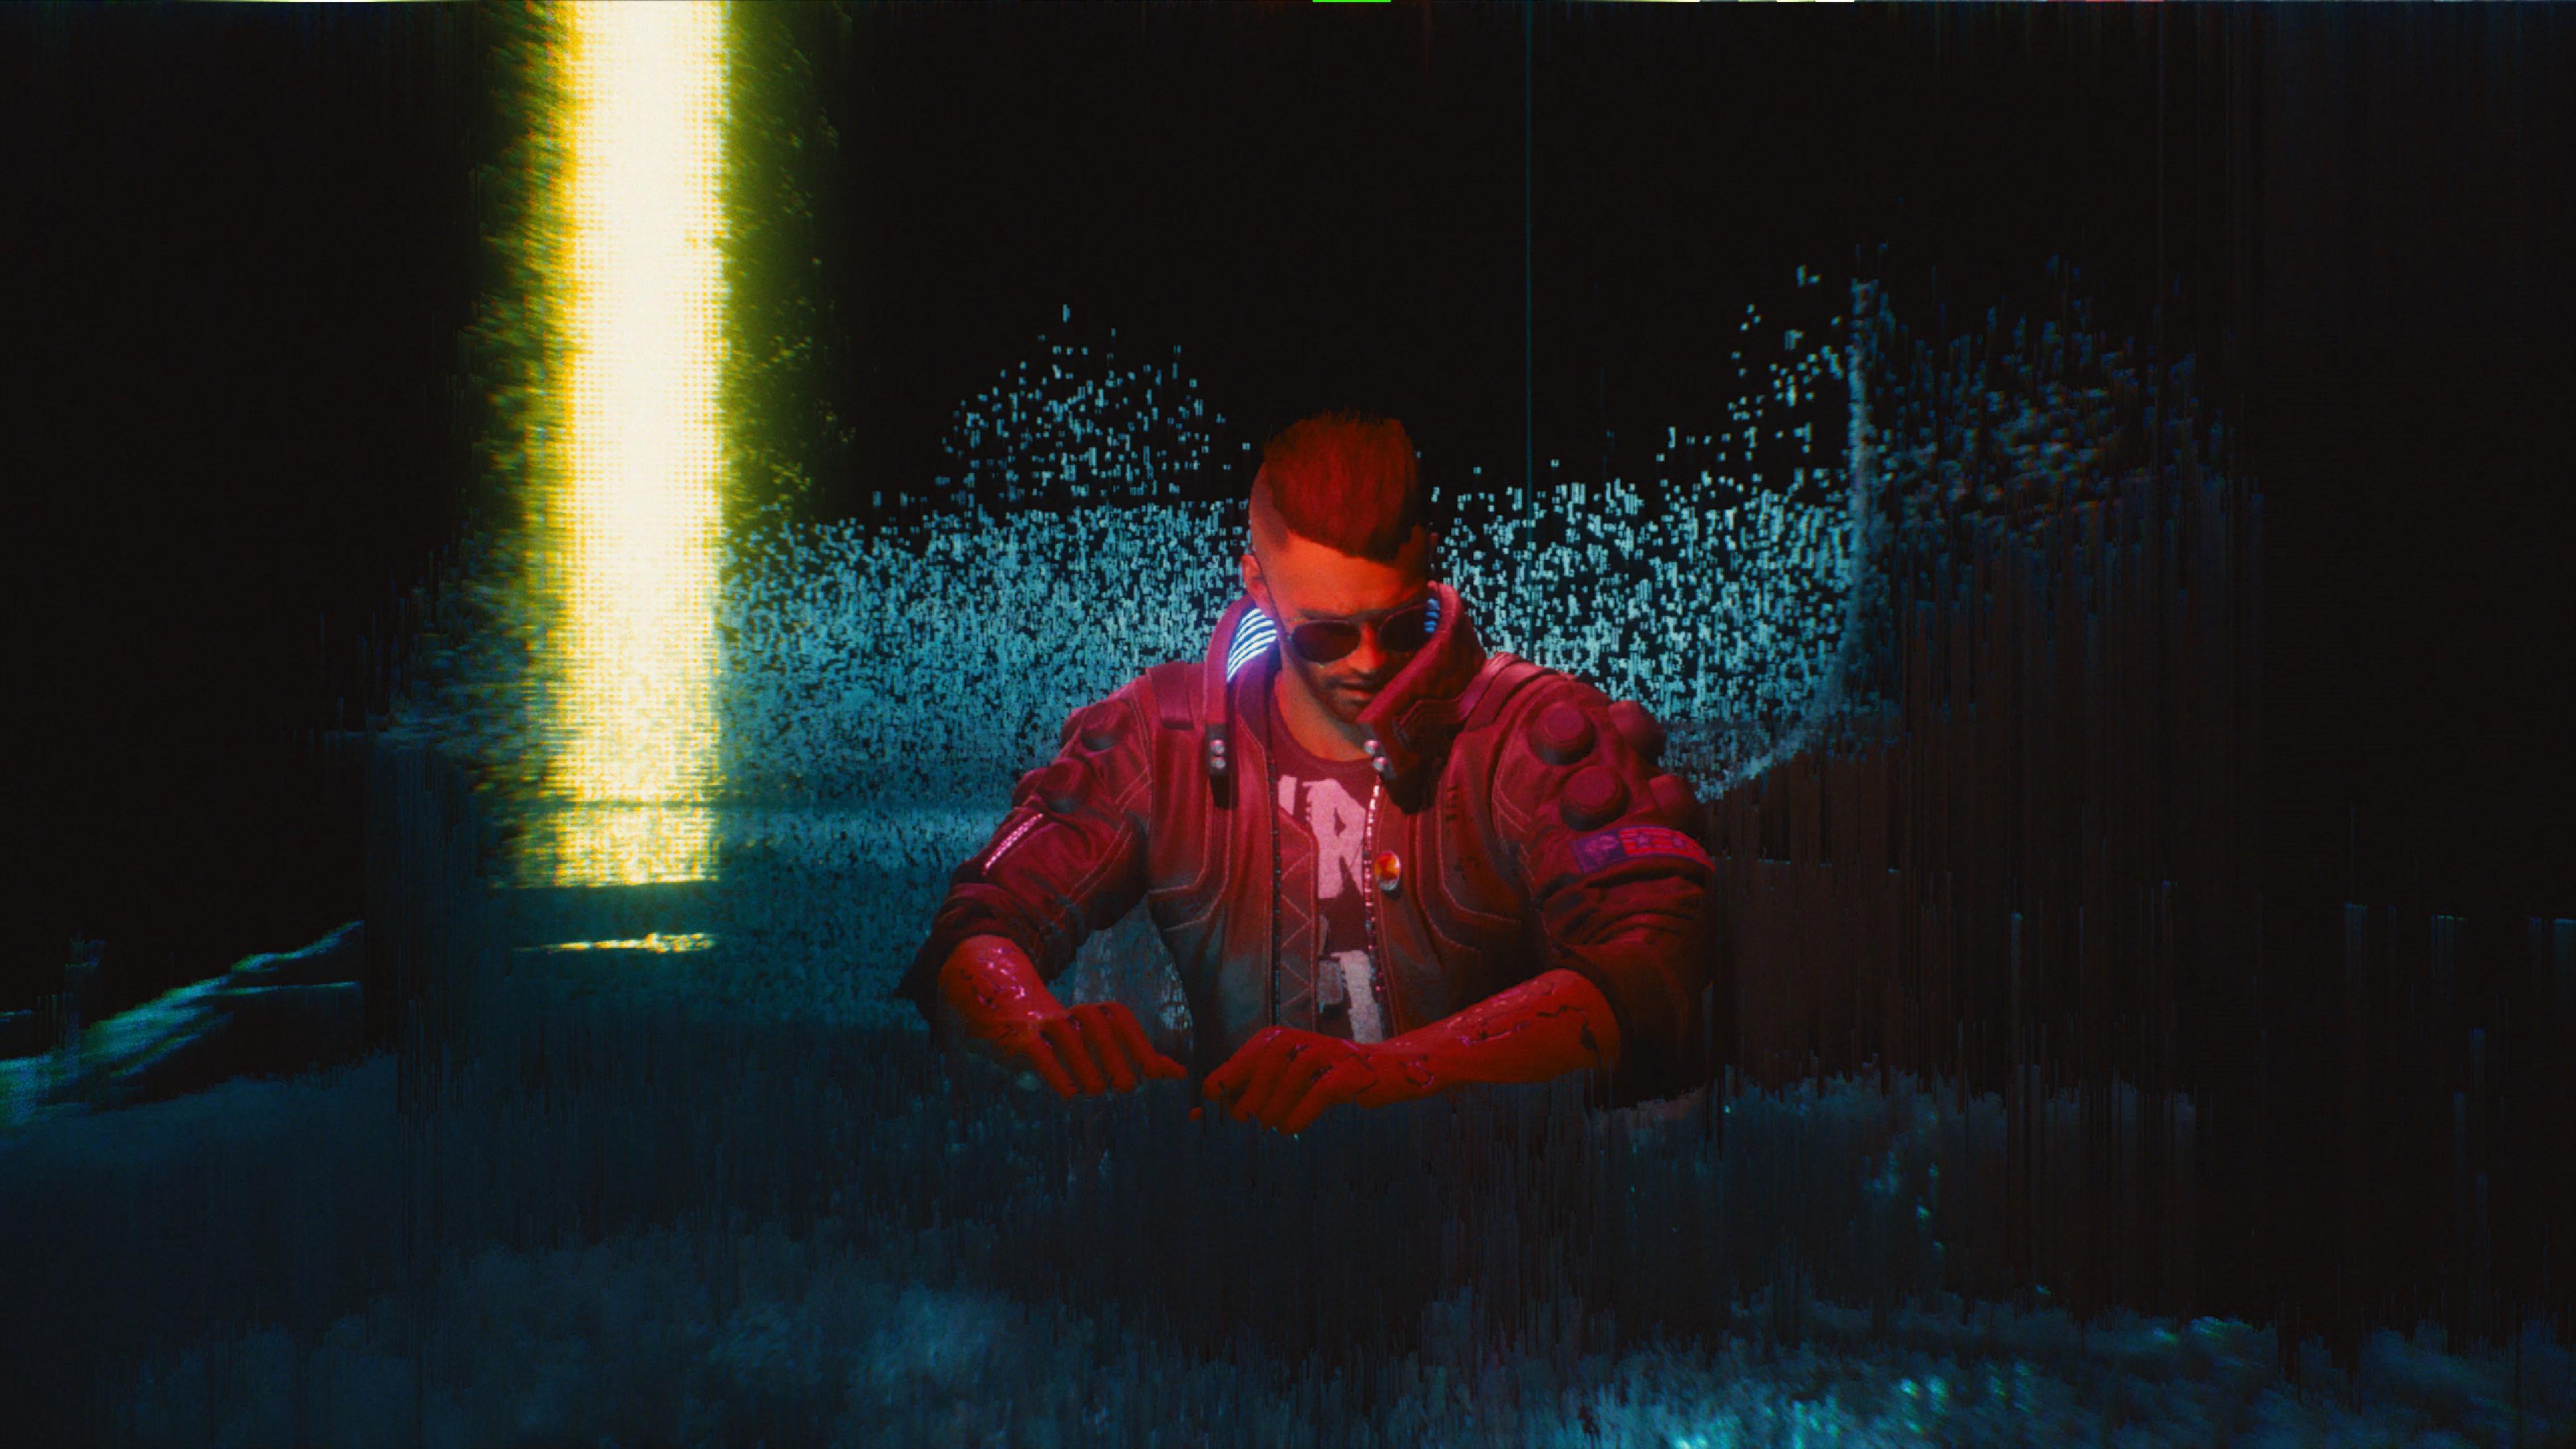 Cyberpunk 2077 - Ende - V oder Johnny